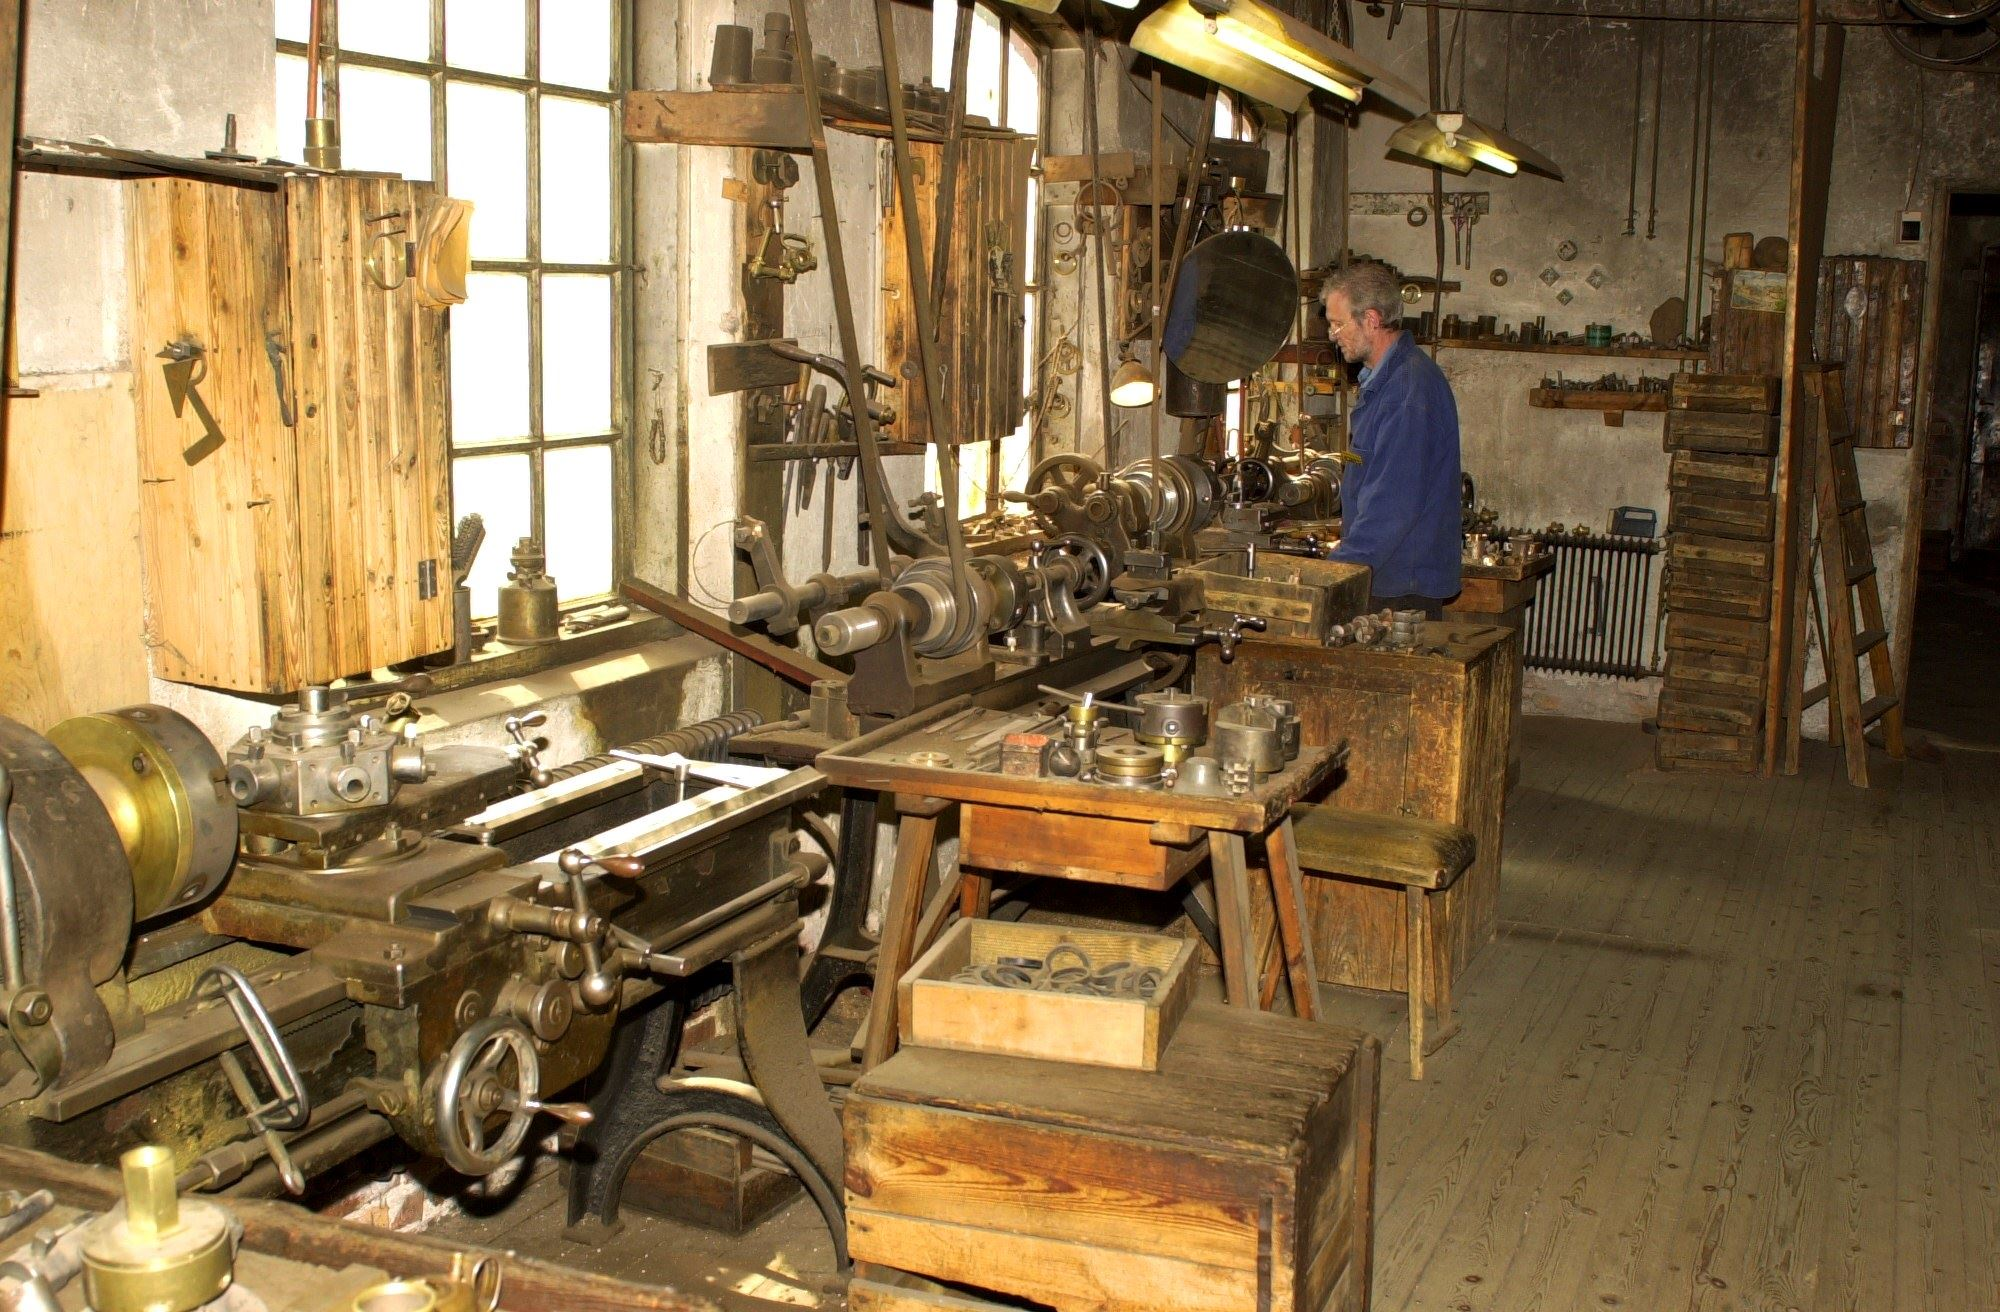 Hylténs Industrimuseum - Hylténs Industrial Museum